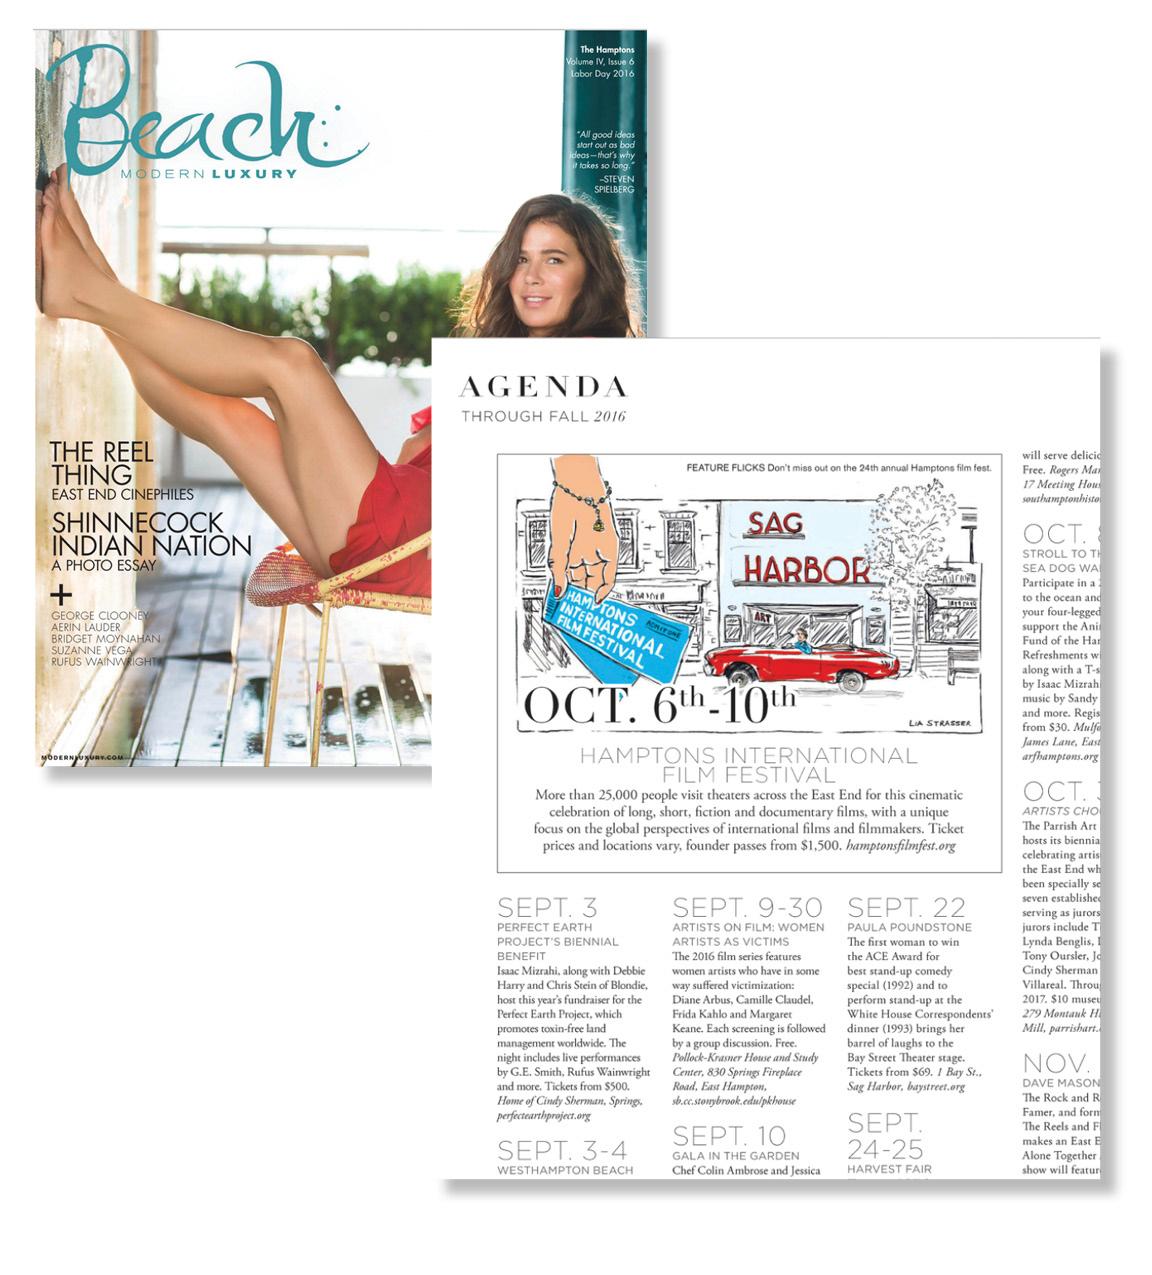 Lia Strasser Beach Modern Luxury Cristina Cuomo